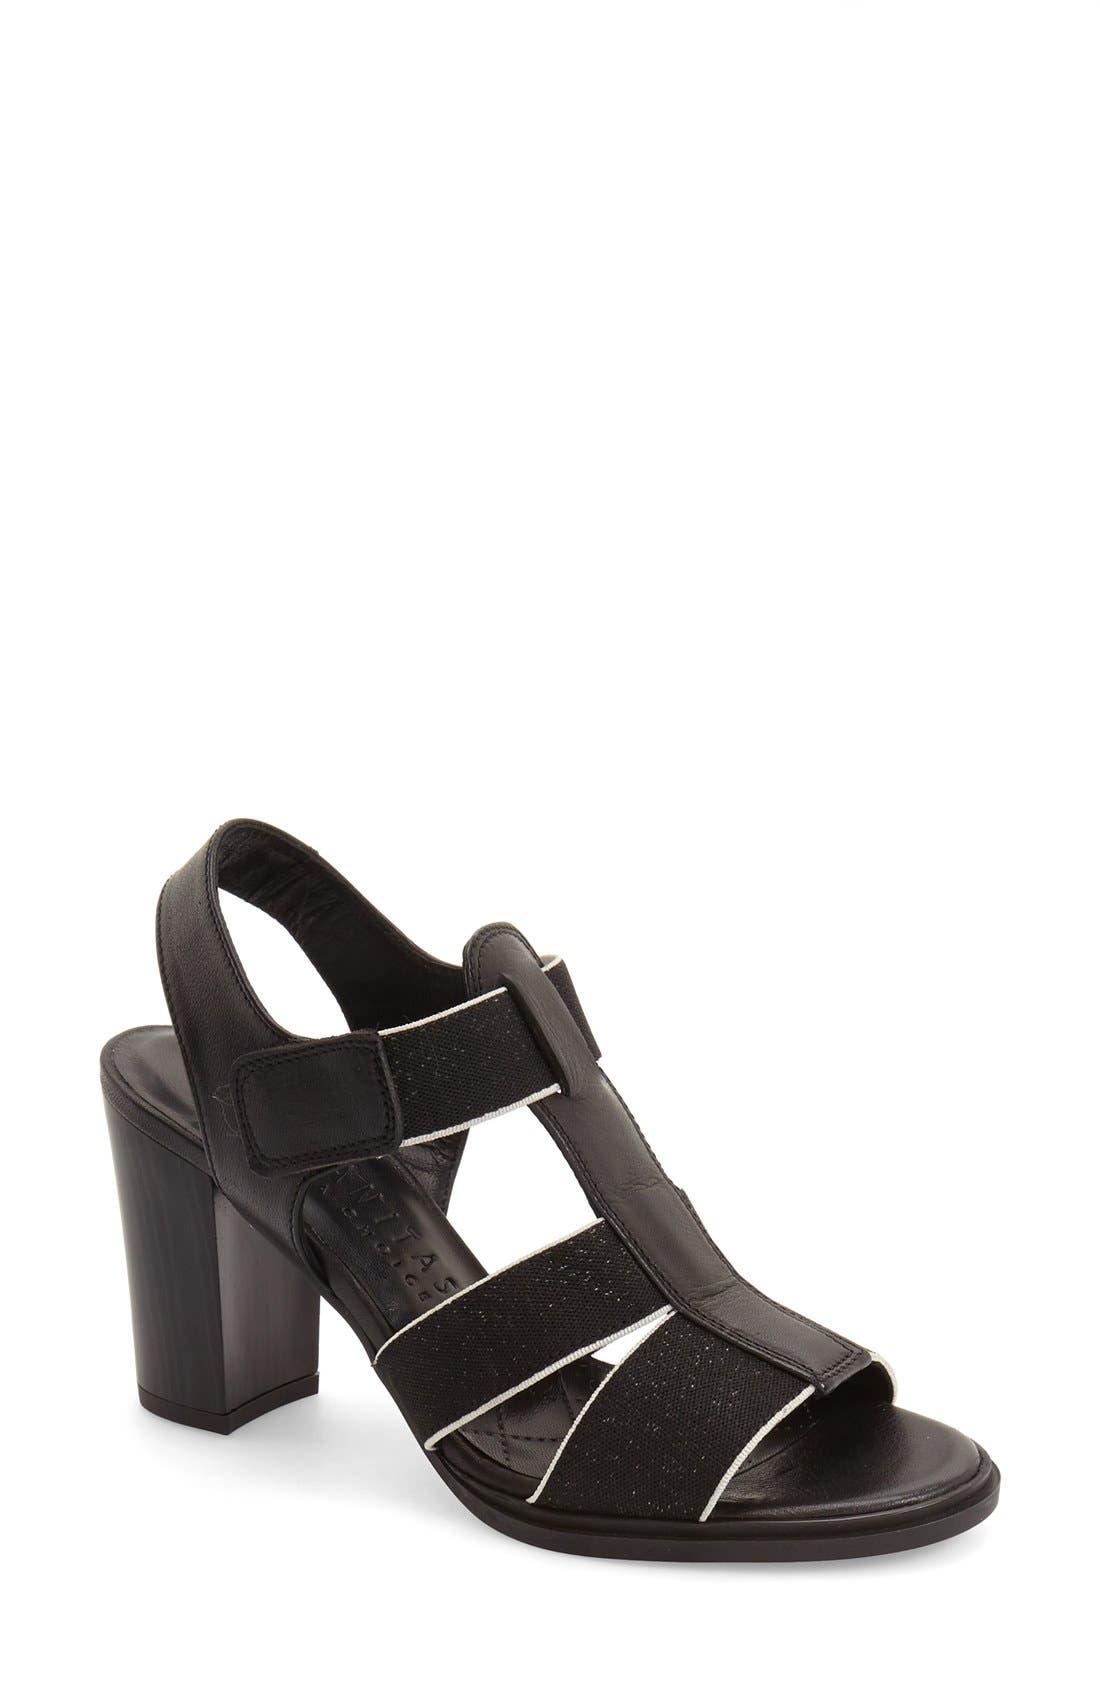 'Matchless' Sandal,                             Main thumbnail 1, color,                             Black Leather